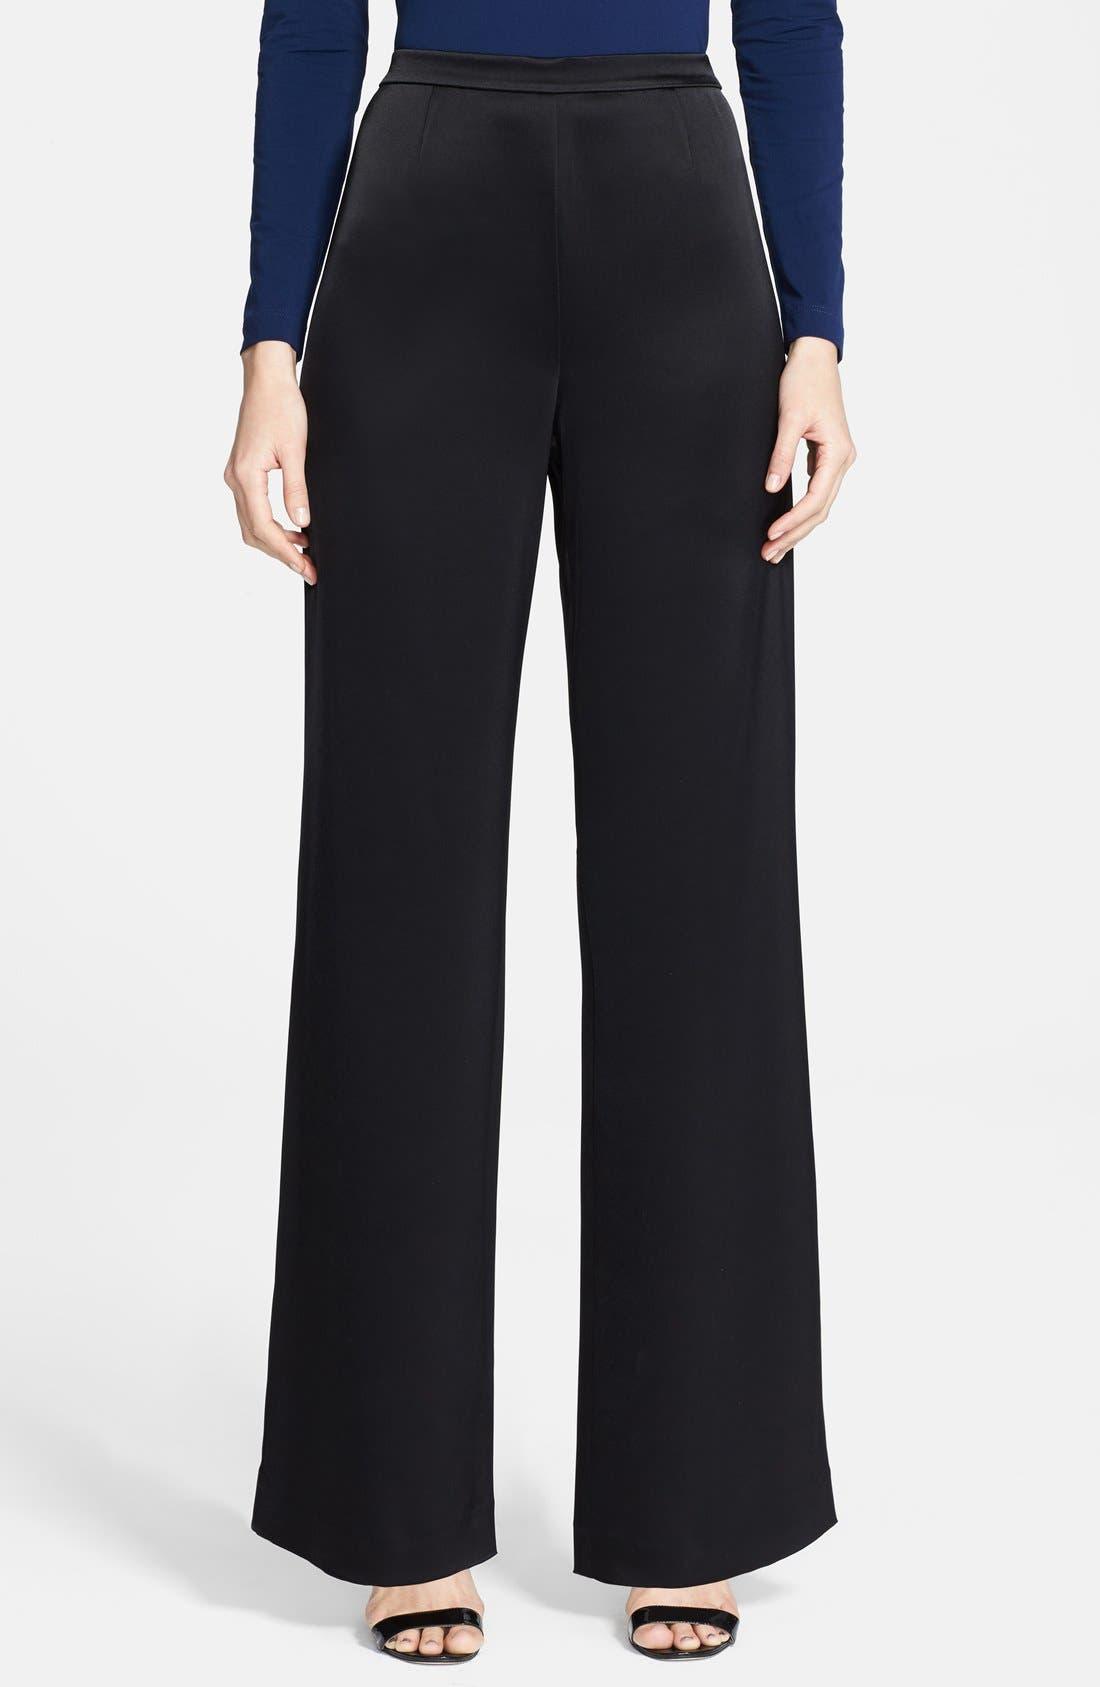 'Kate' Liquid Satin Pants,                         Main,                         color, CAVIAR